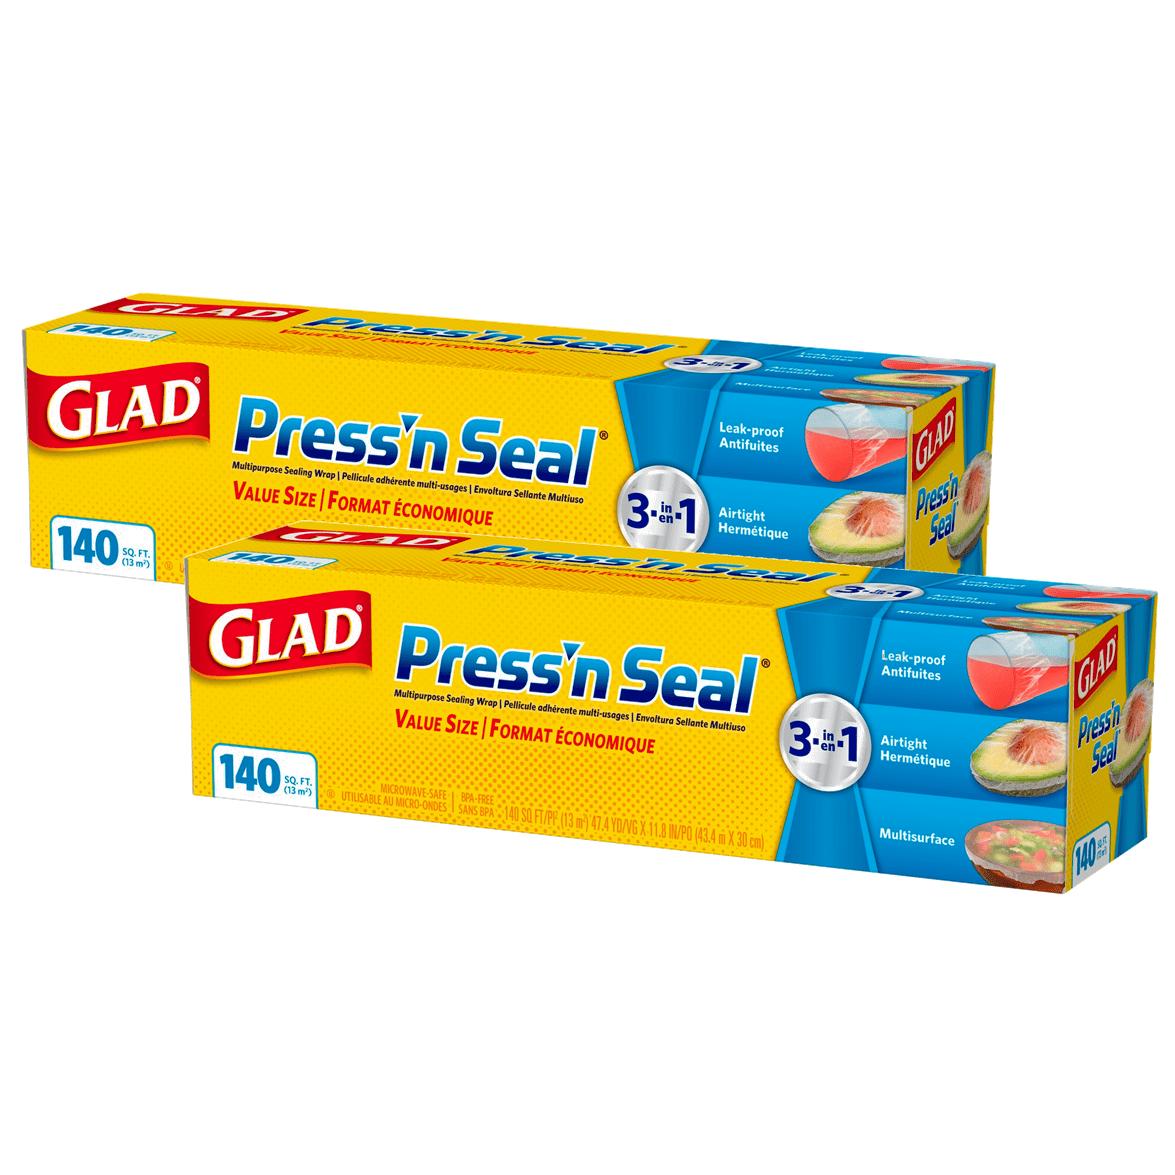 (2 pack) Glad Press'n Seal Food Plastic Wrap - 140 sq ft Roll